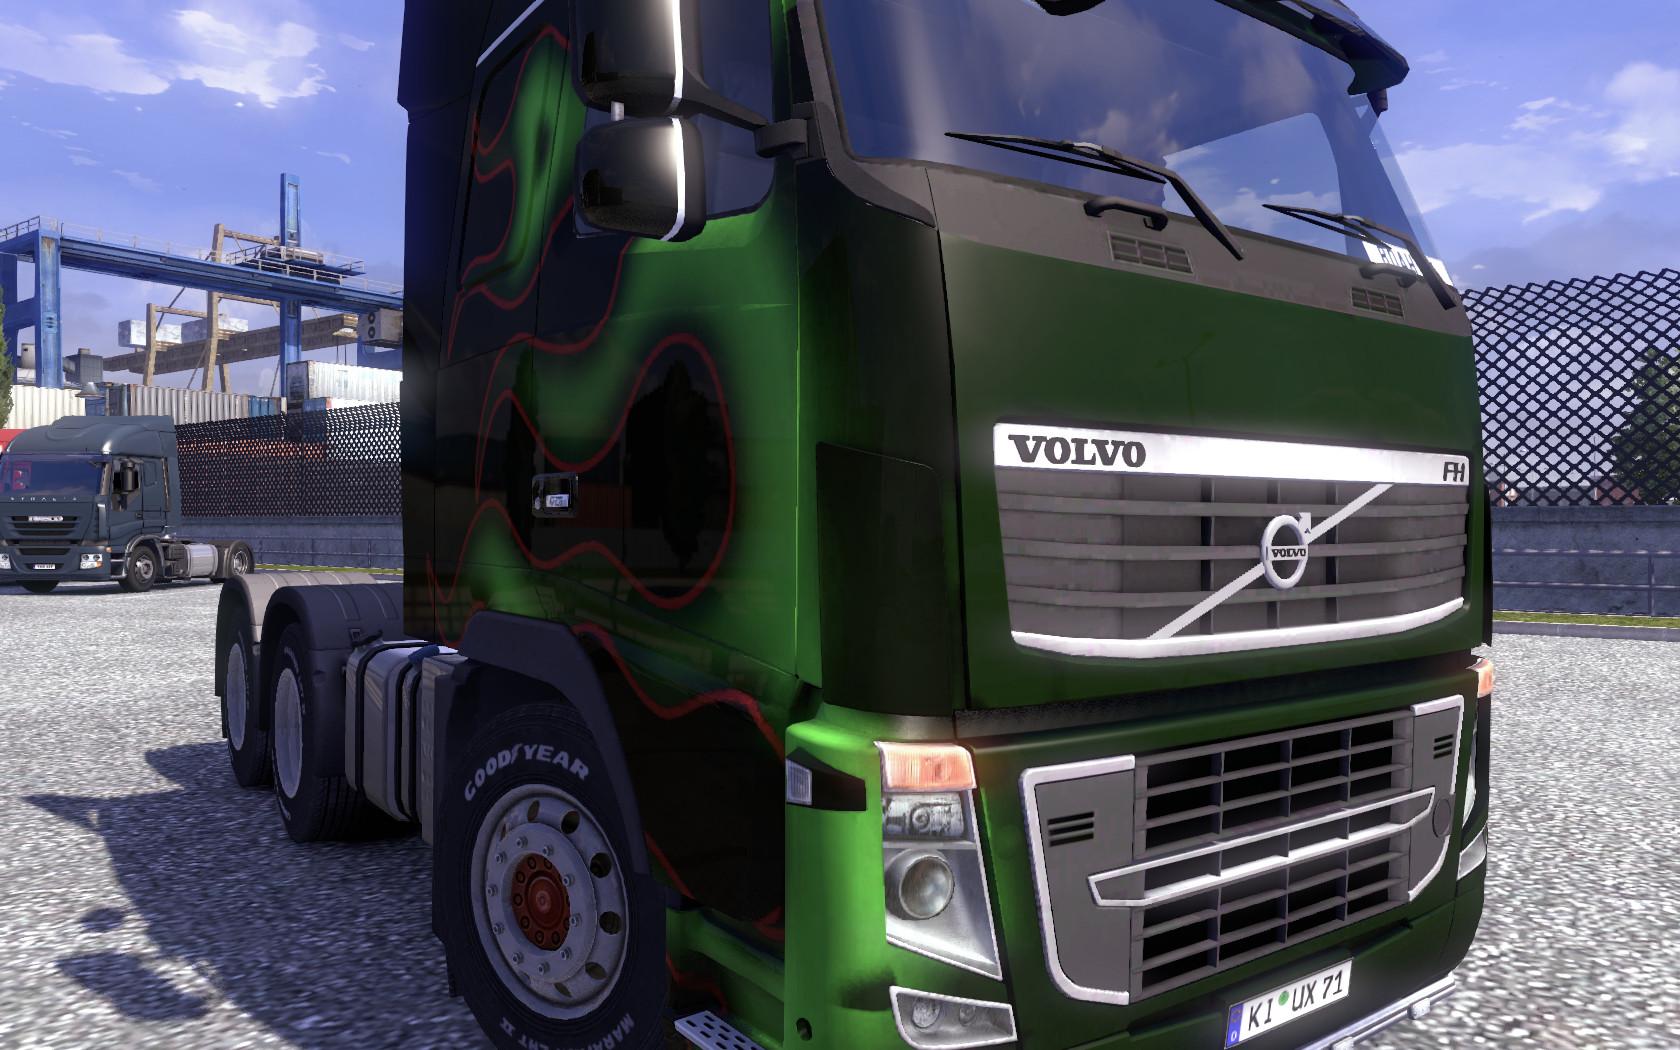 [Sammelthread] Euro Truck Simulator 2 [Reifenupdate + Reale Reifen DLC geteasert]-ets2_00134.jpg